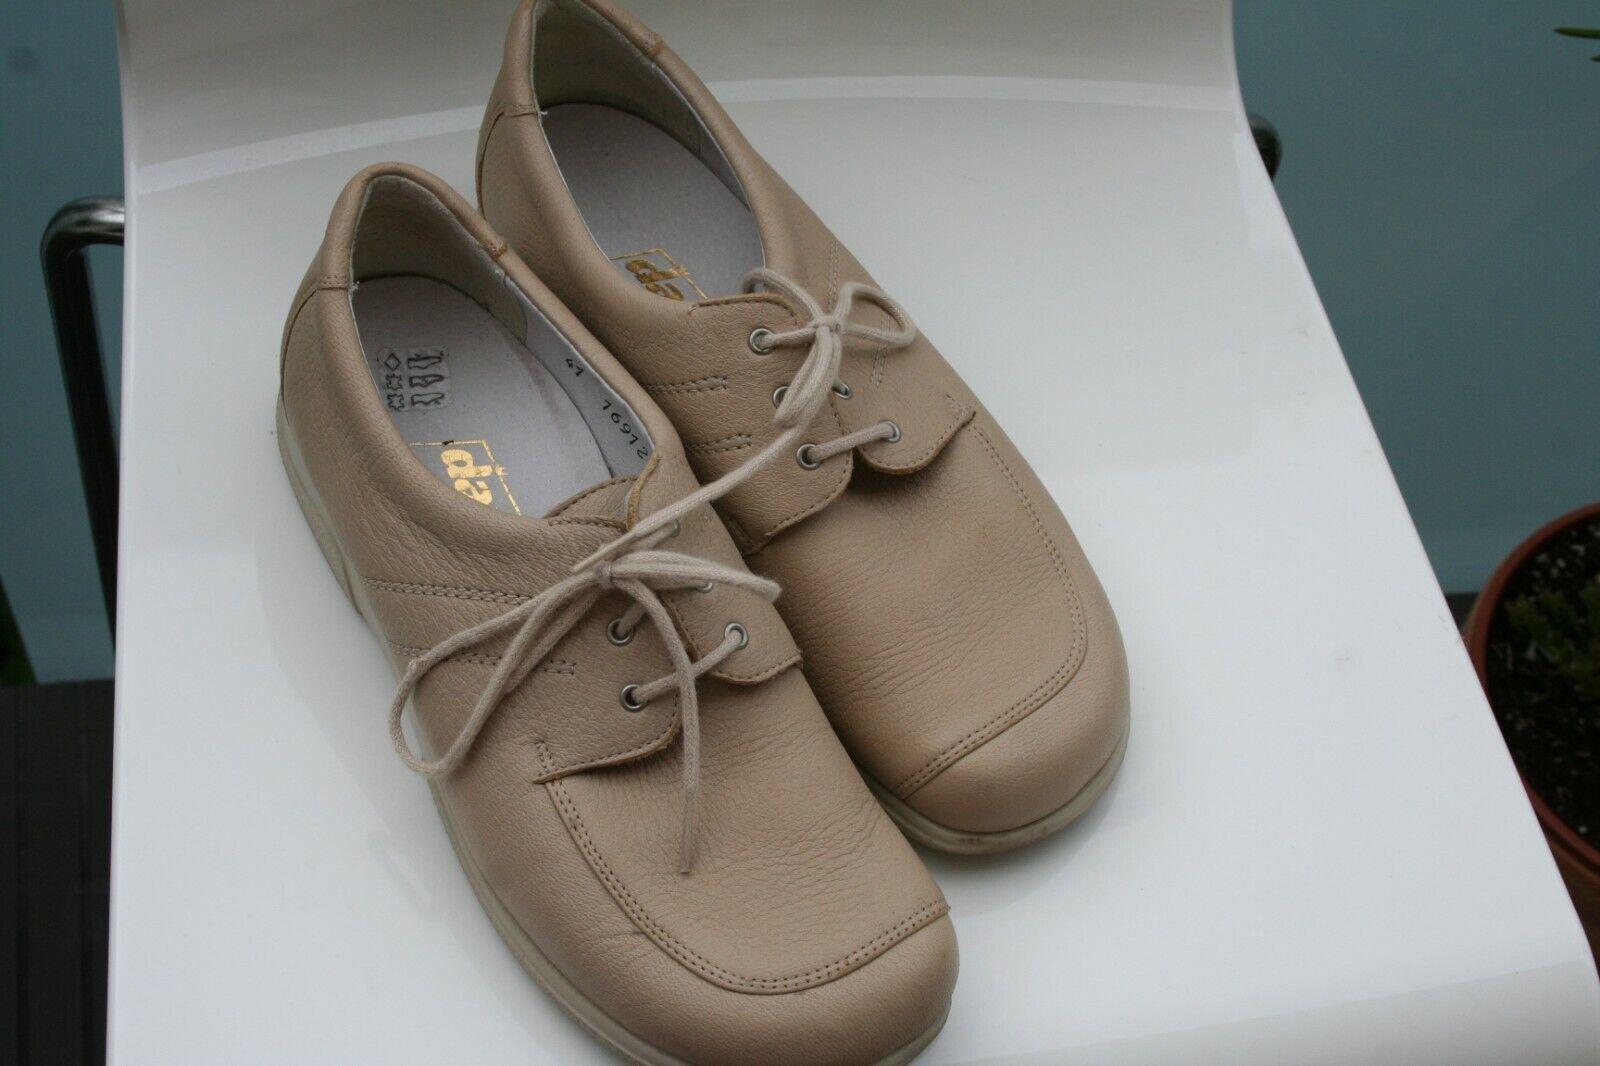 Dansko Damen Schuhe Gr. 41 4124bfwry13541 Halbschuhe